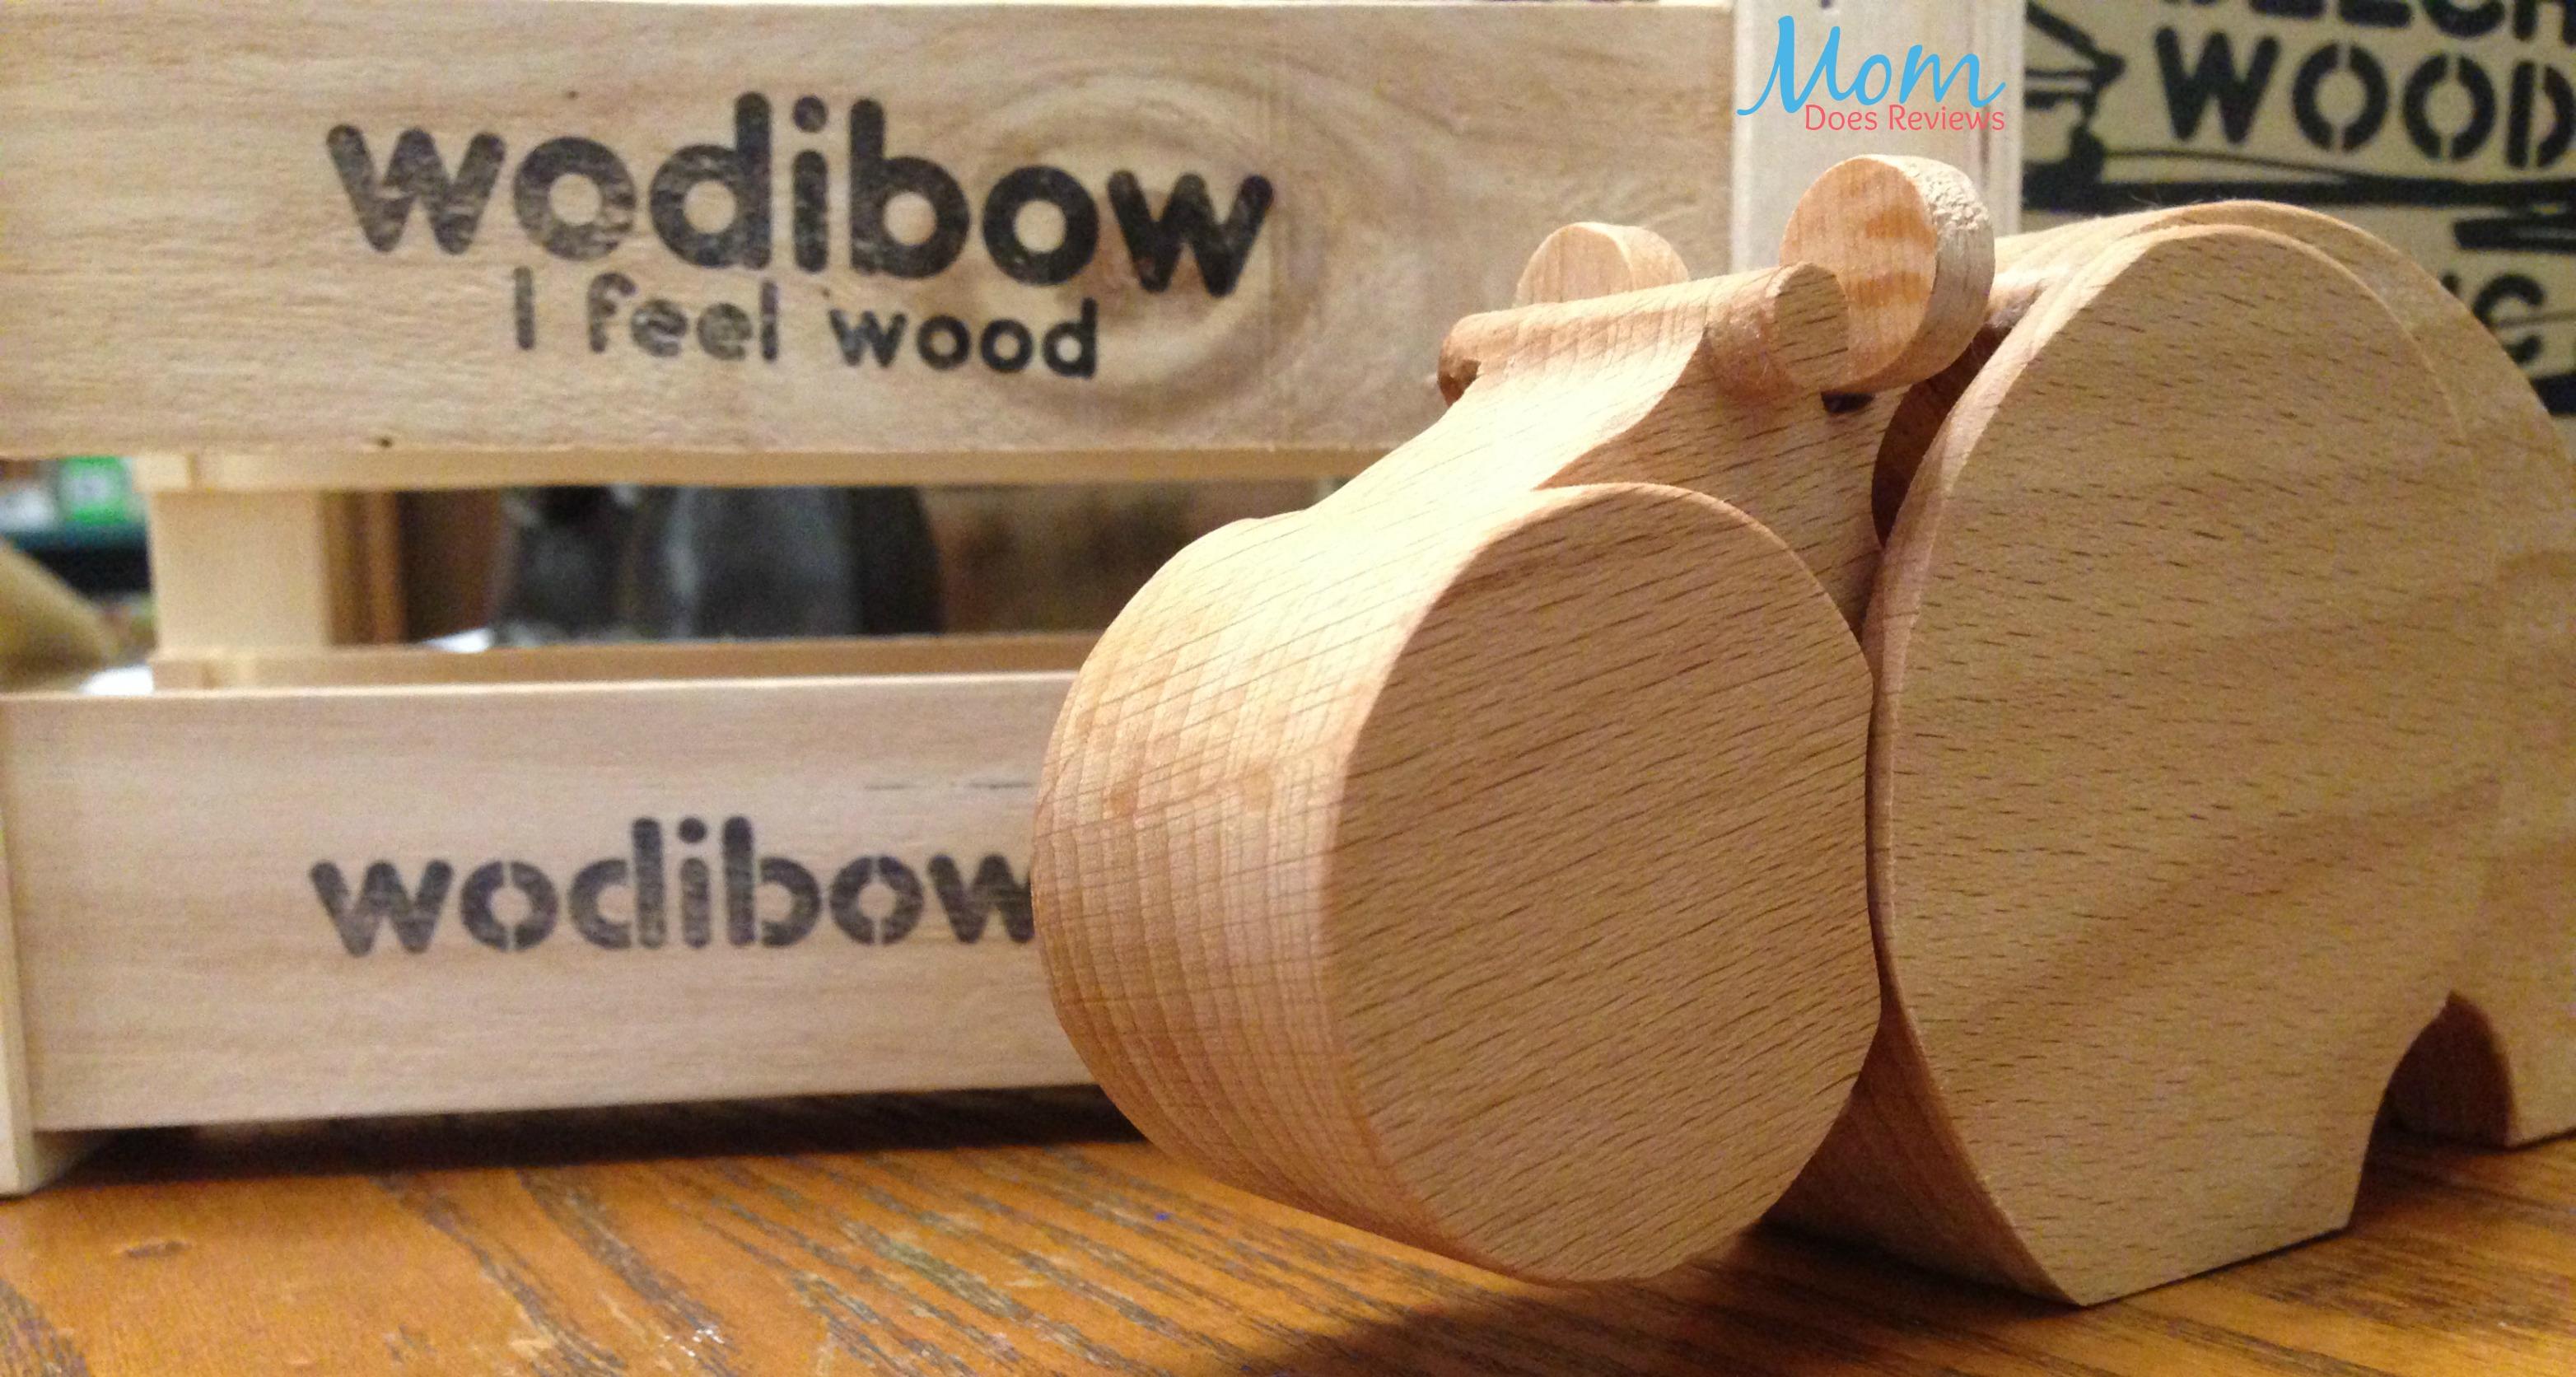 ohtoys-woodibow